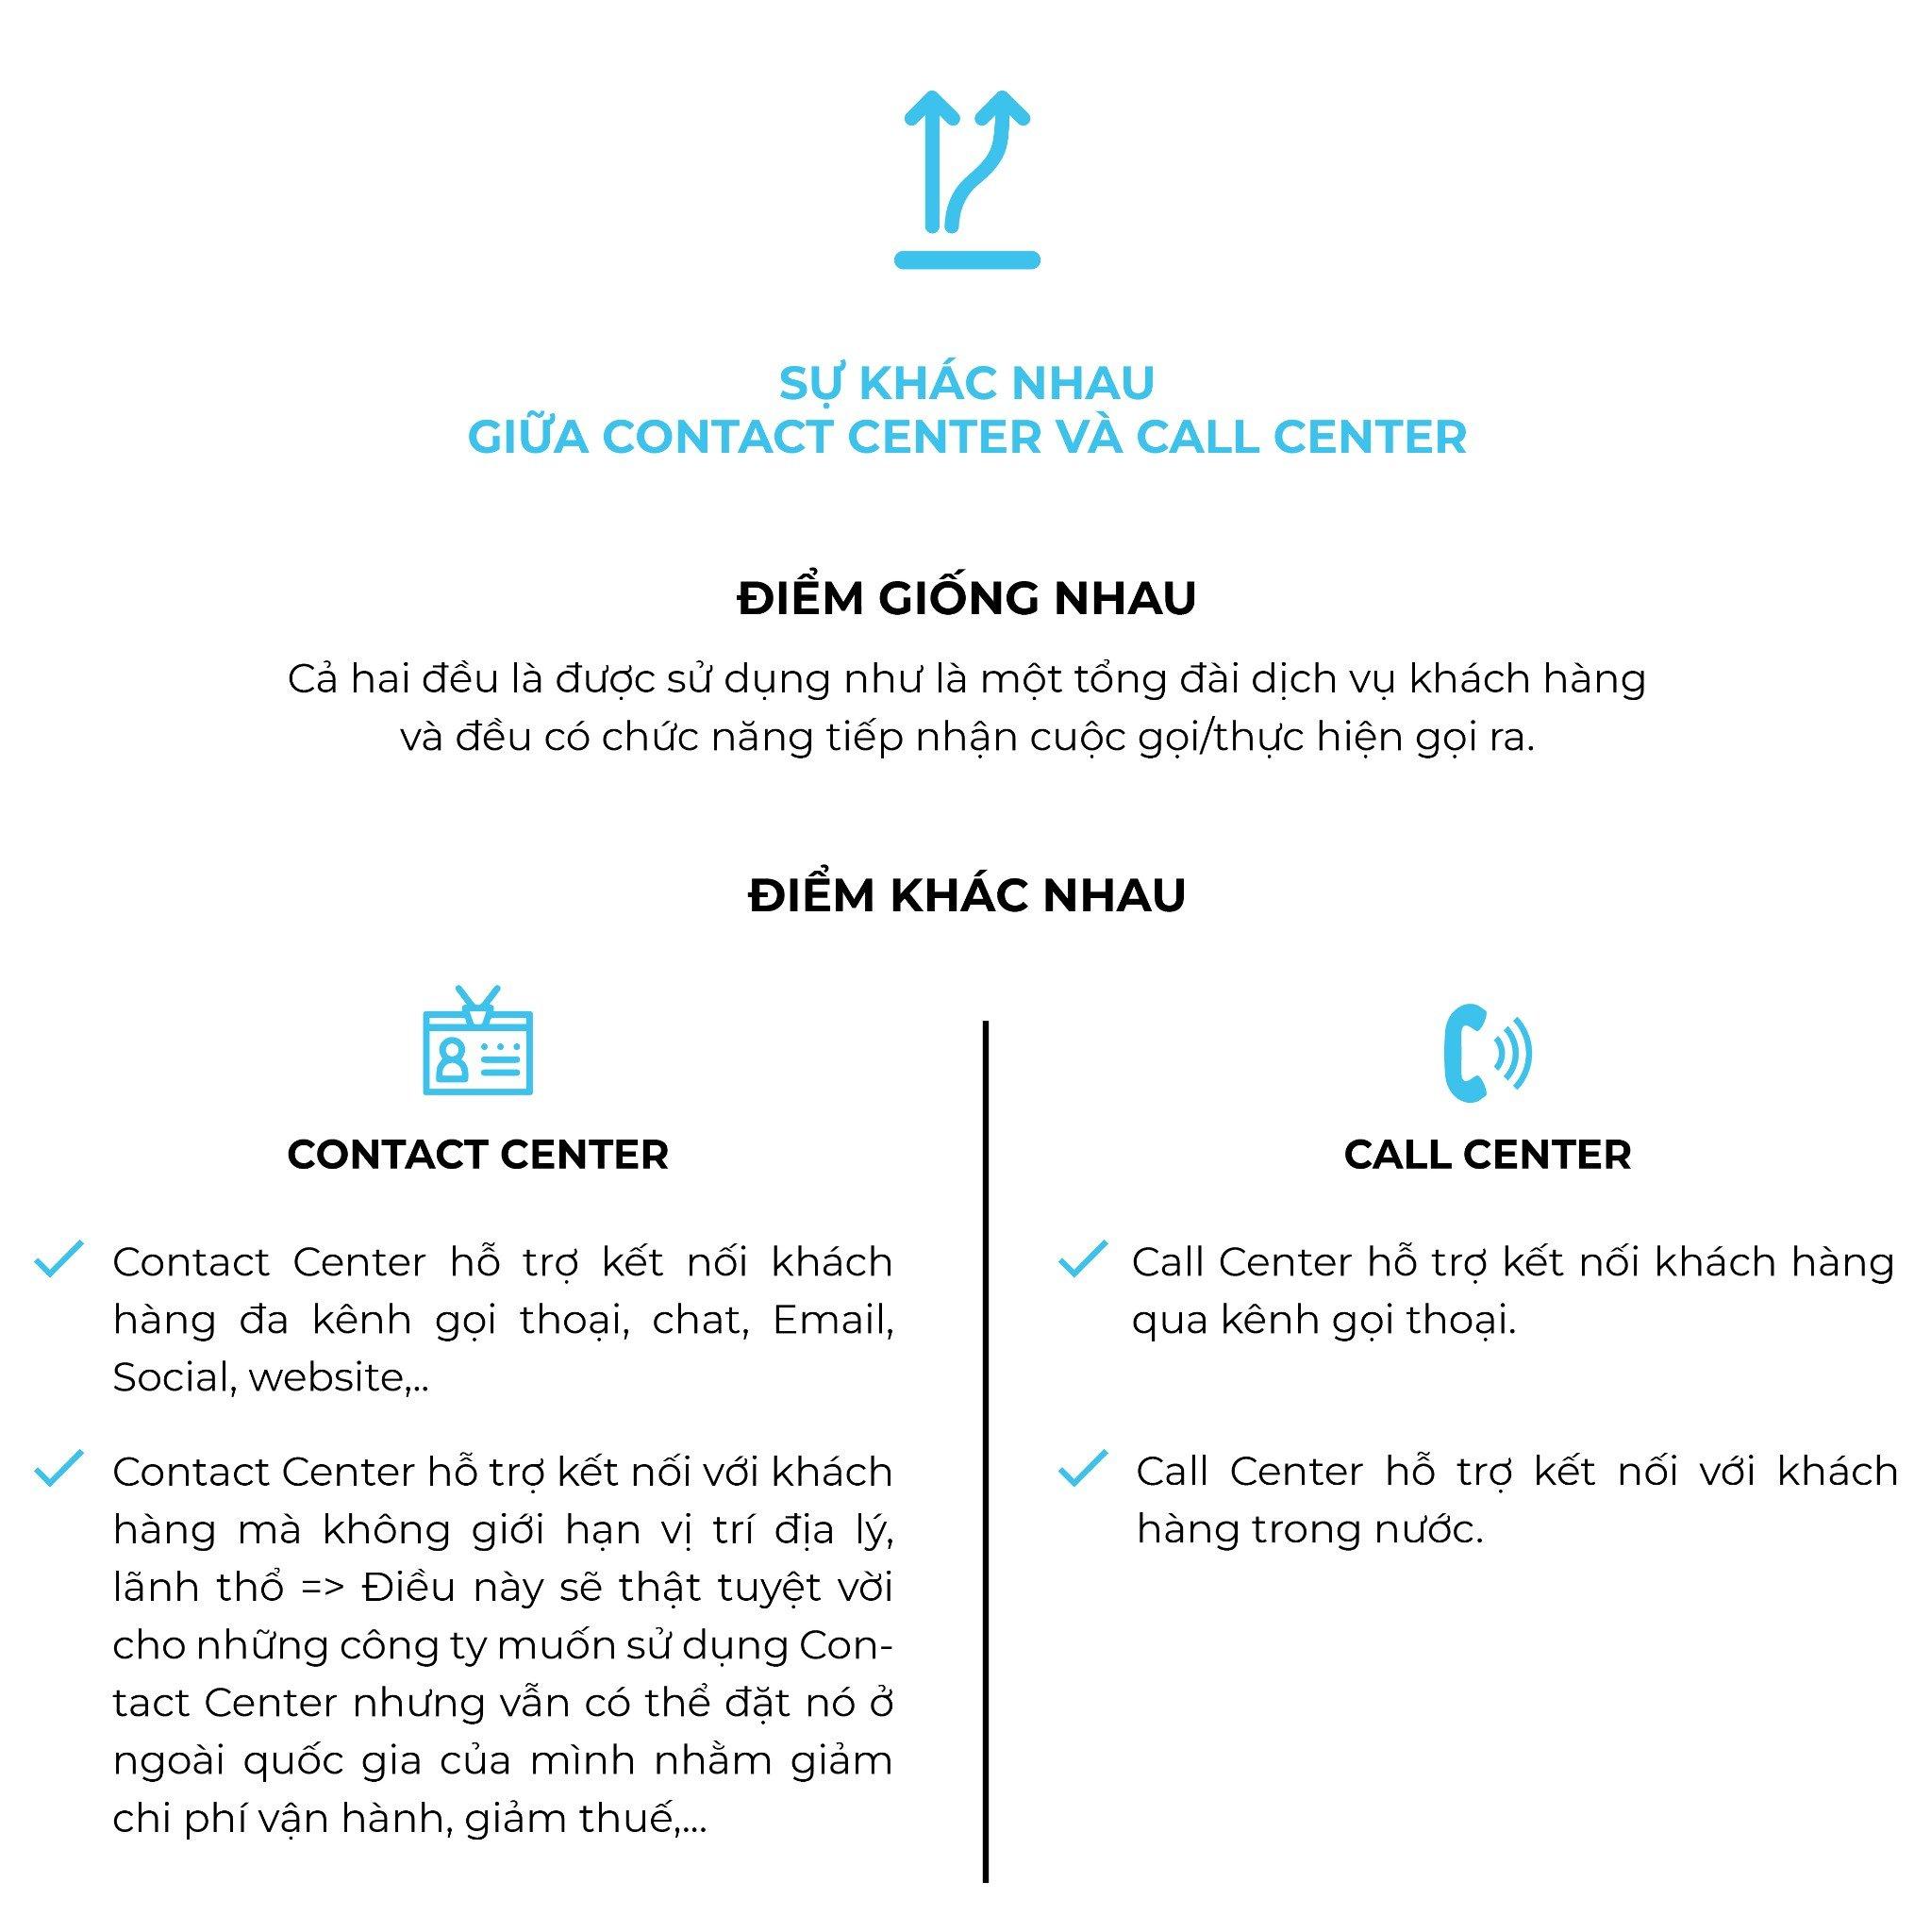 contact center và call center